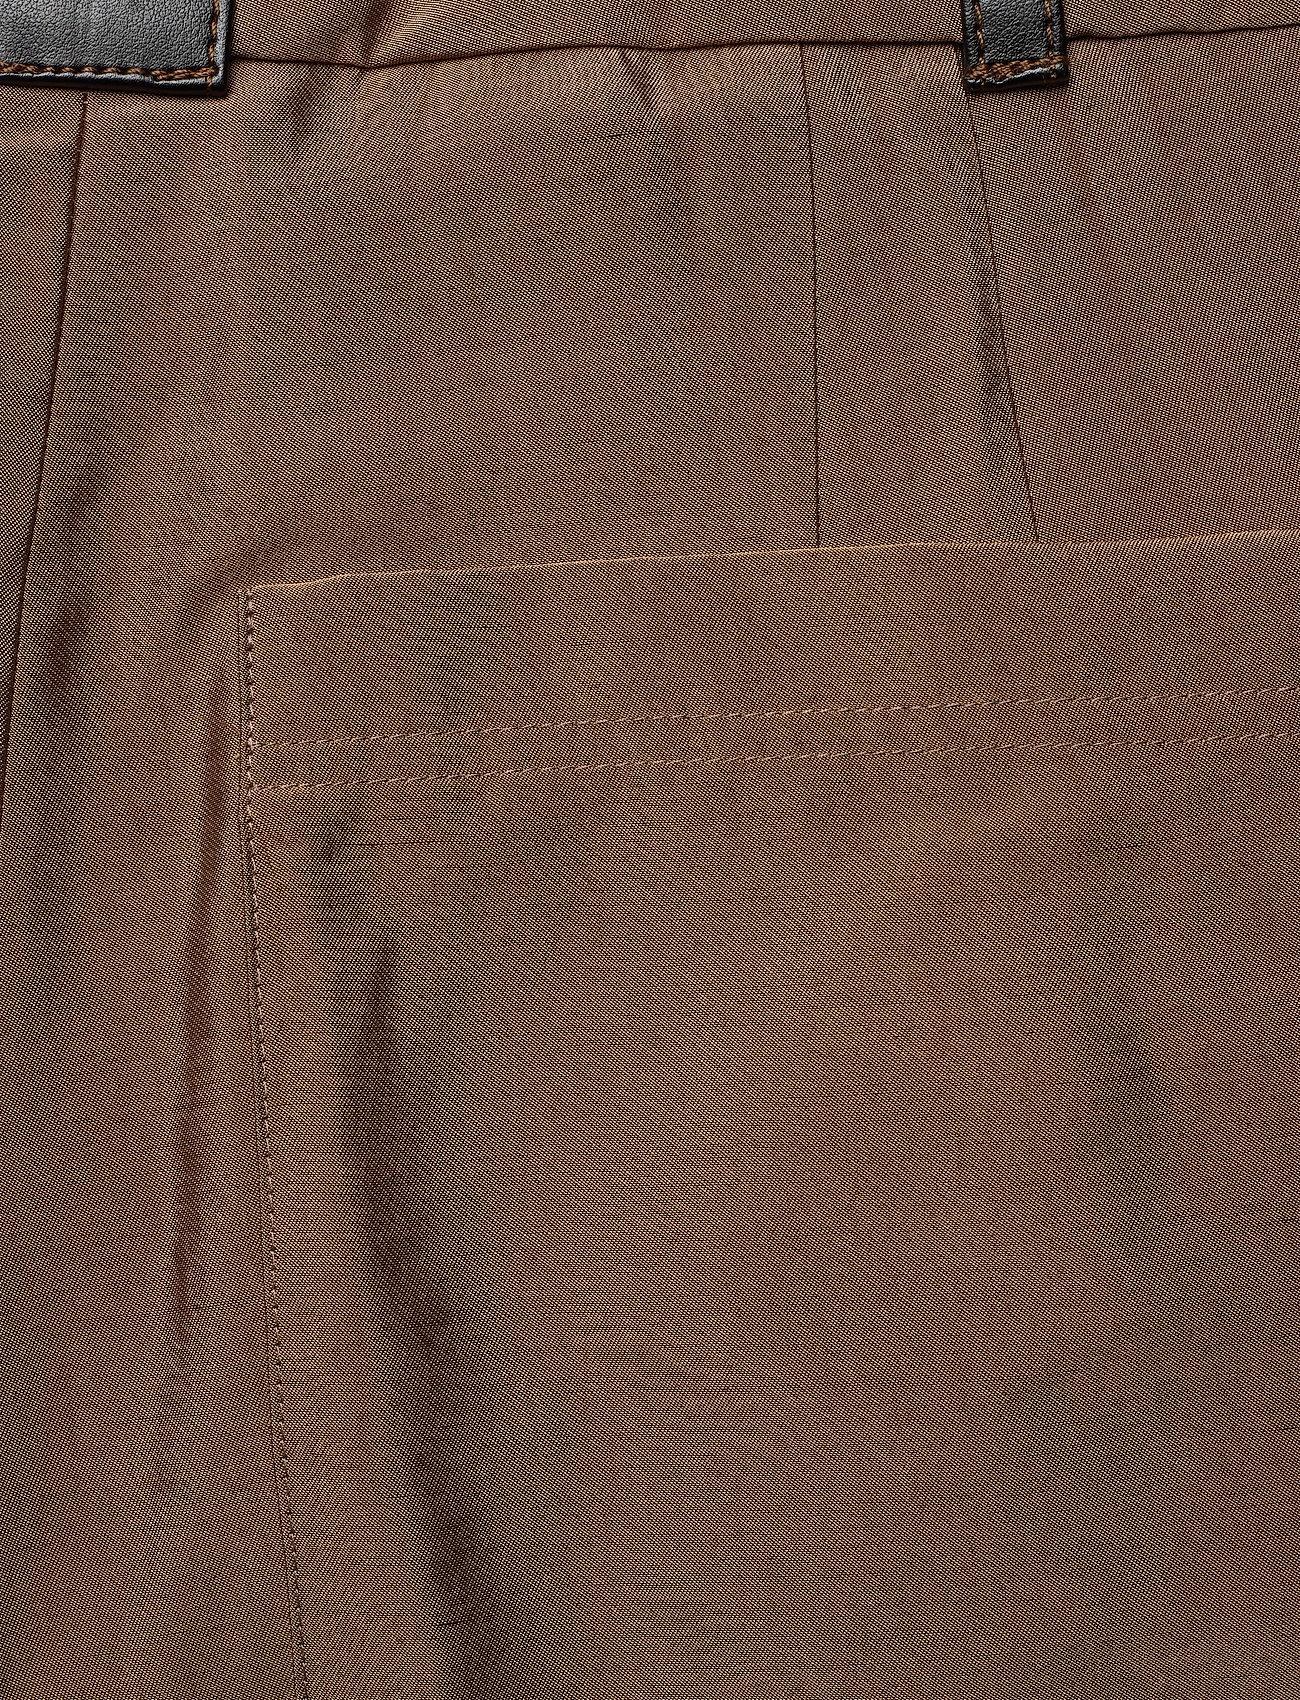 Chet 847 Tailoring (Mocha) (290 €) - STINE GOYA y3WDIMUD